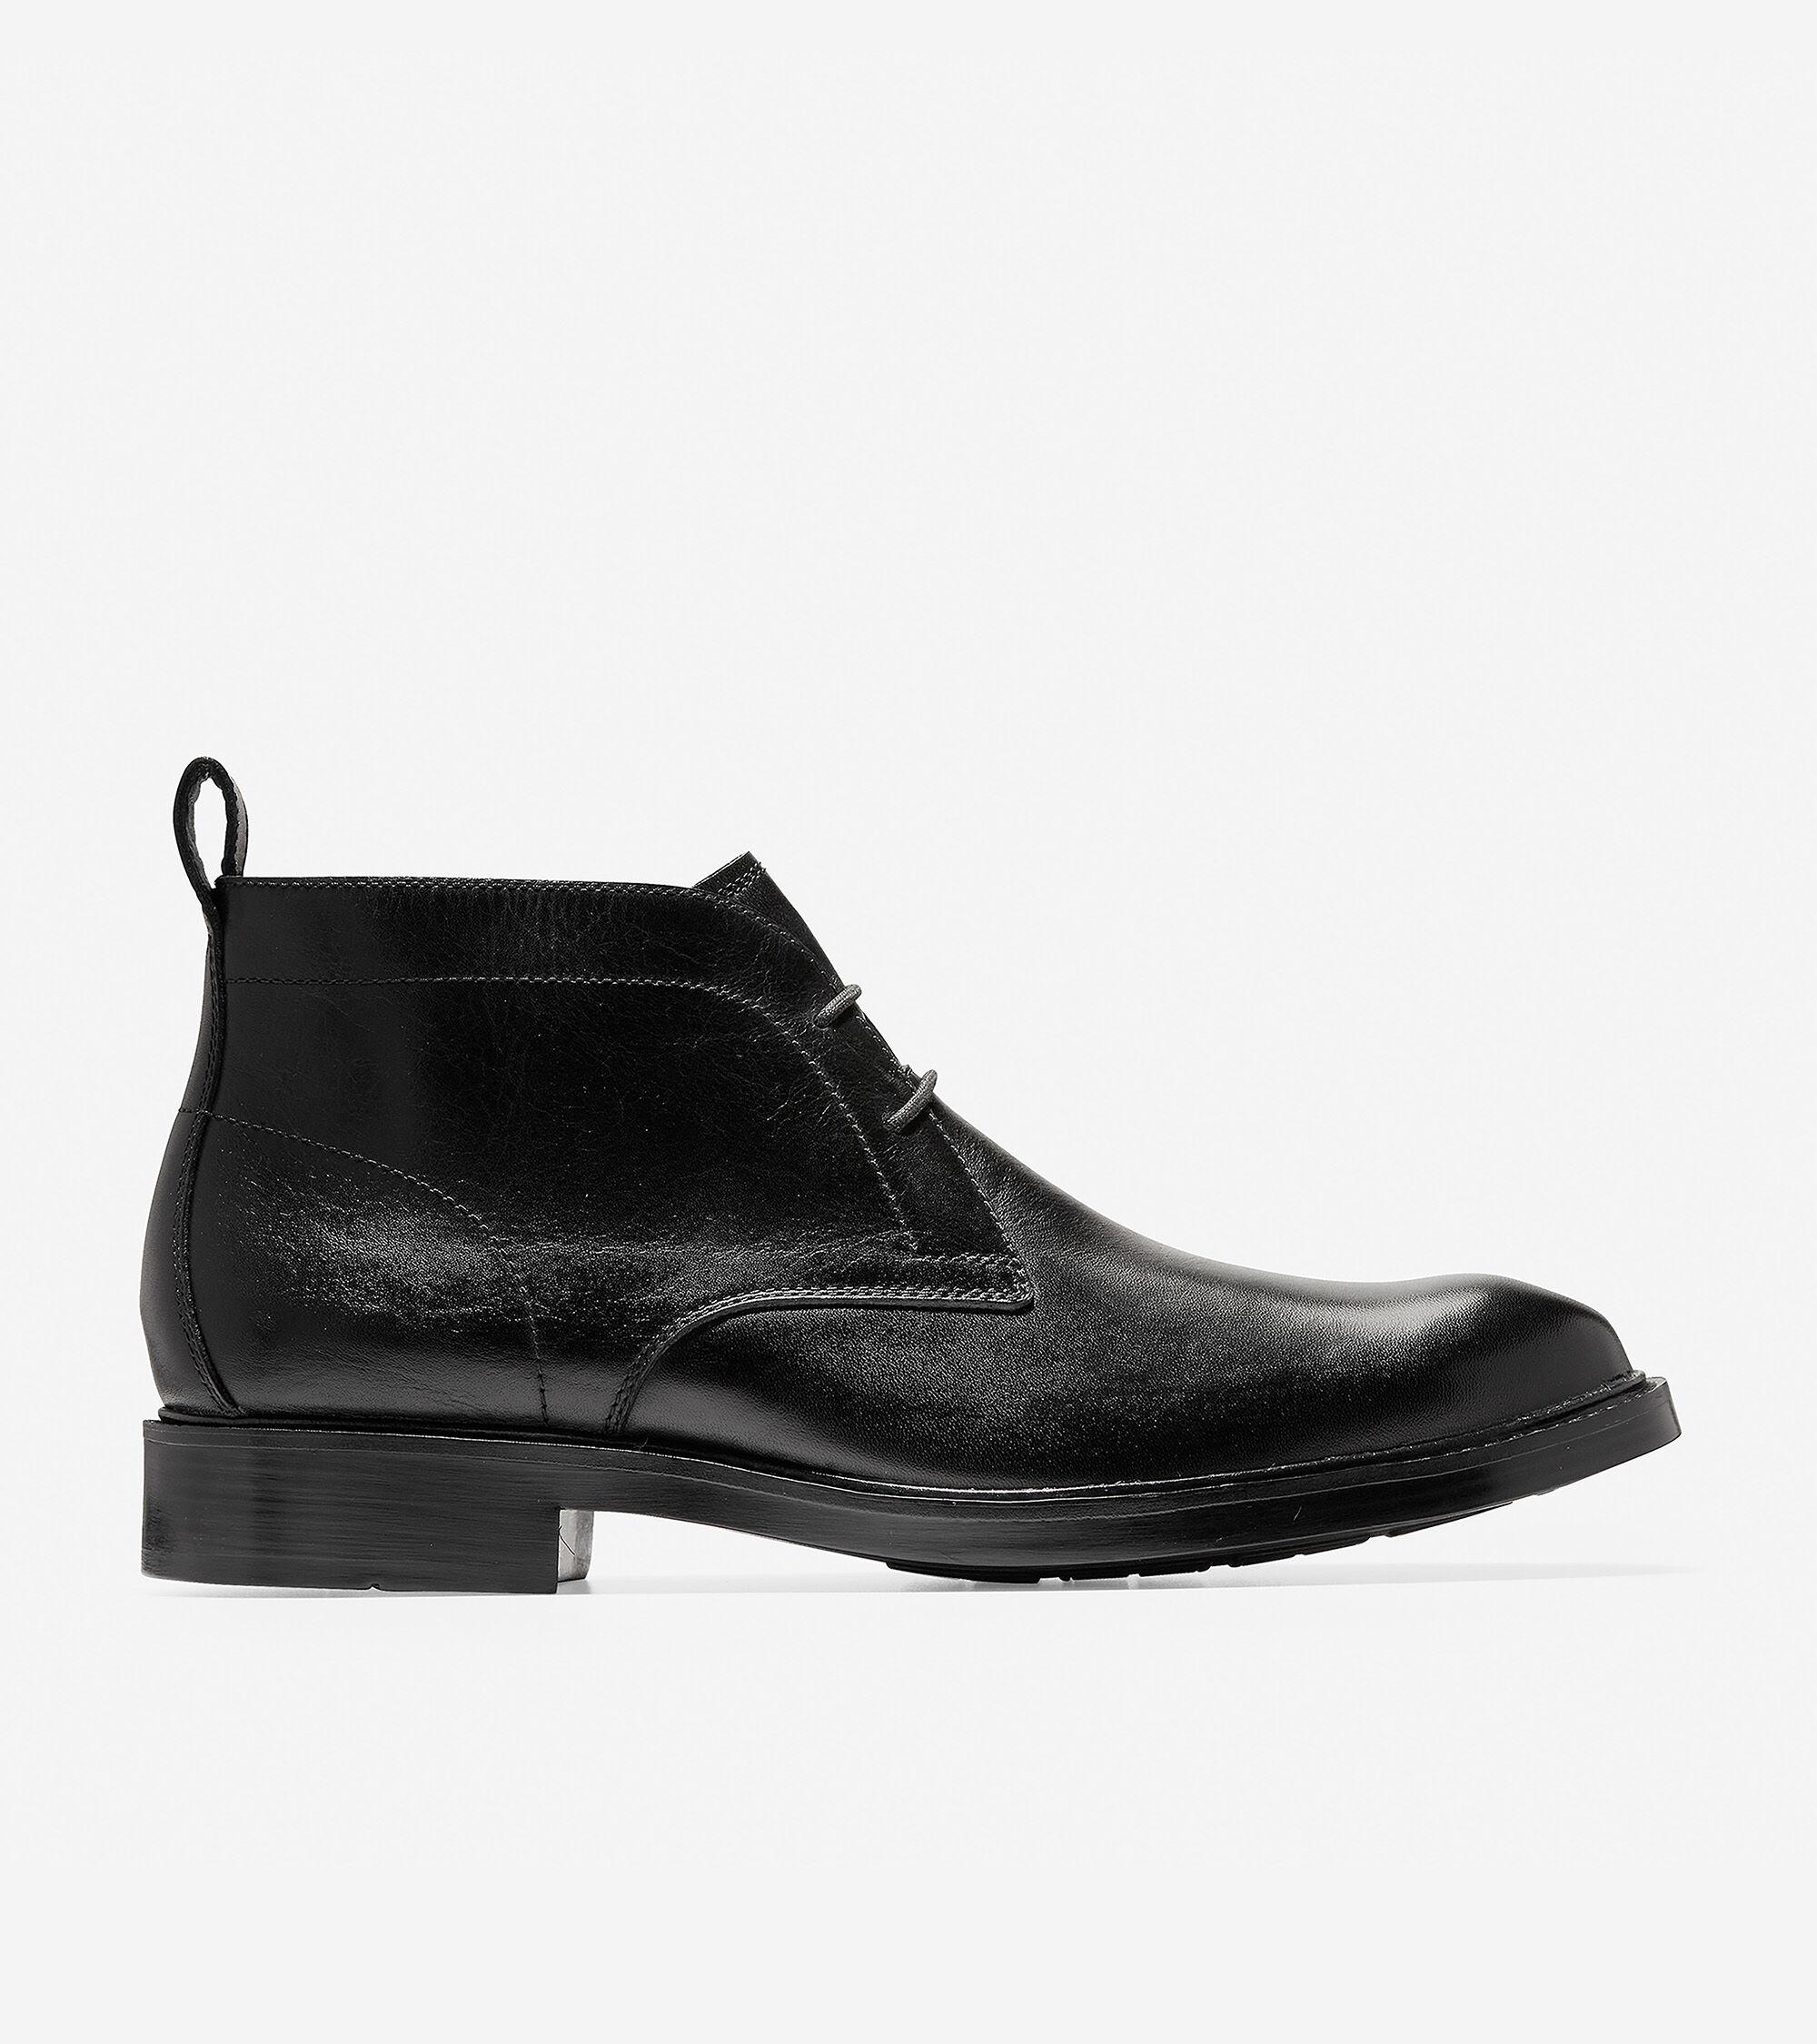 Men's Kennedy Grand Chukka Boot in